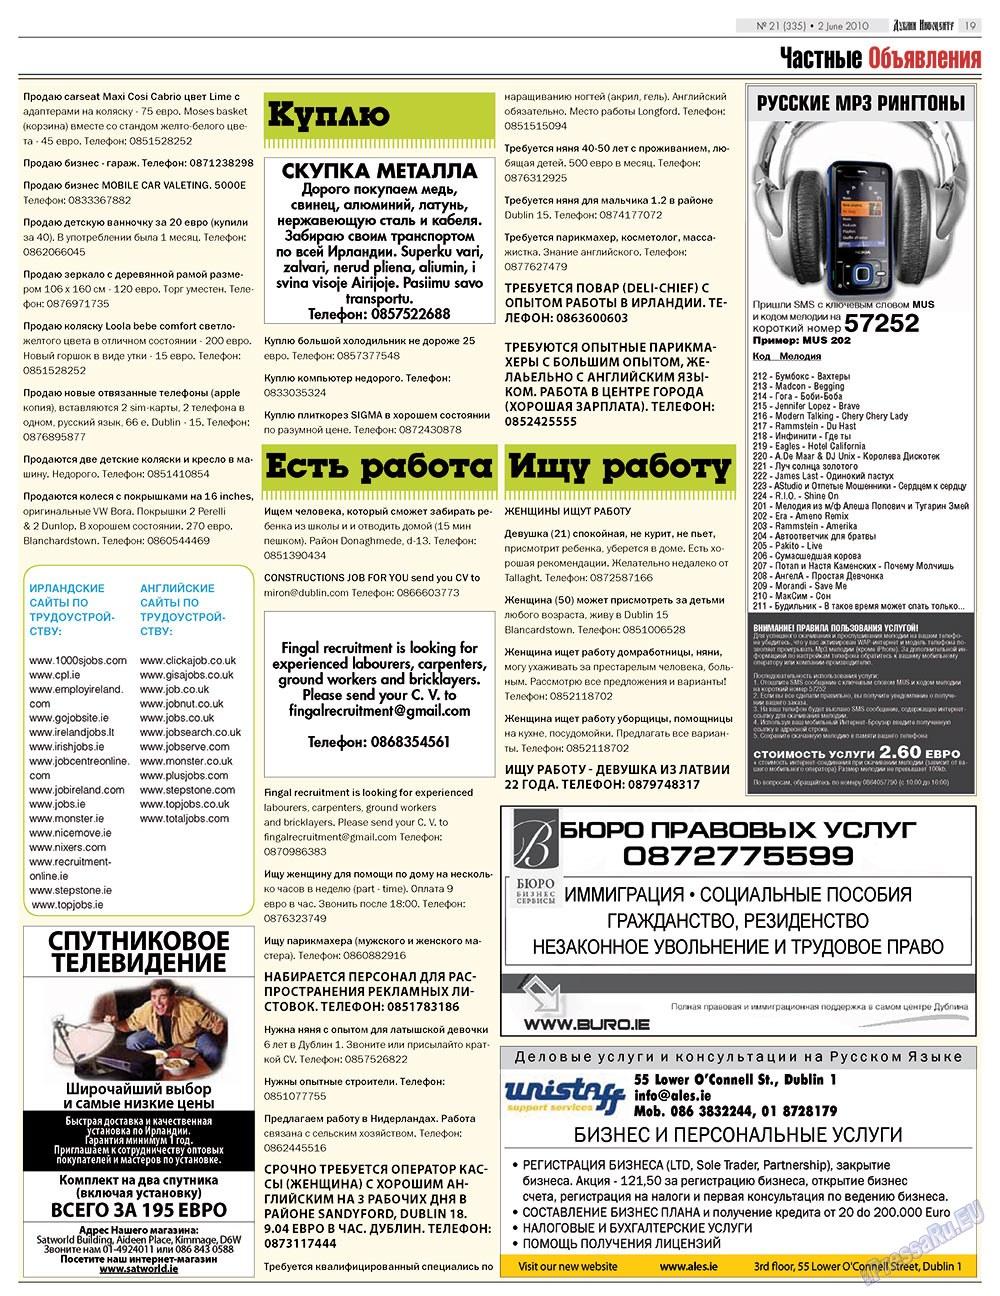 Дублин инфоцентр (газета). 2010 год, номер 21, стр. 19